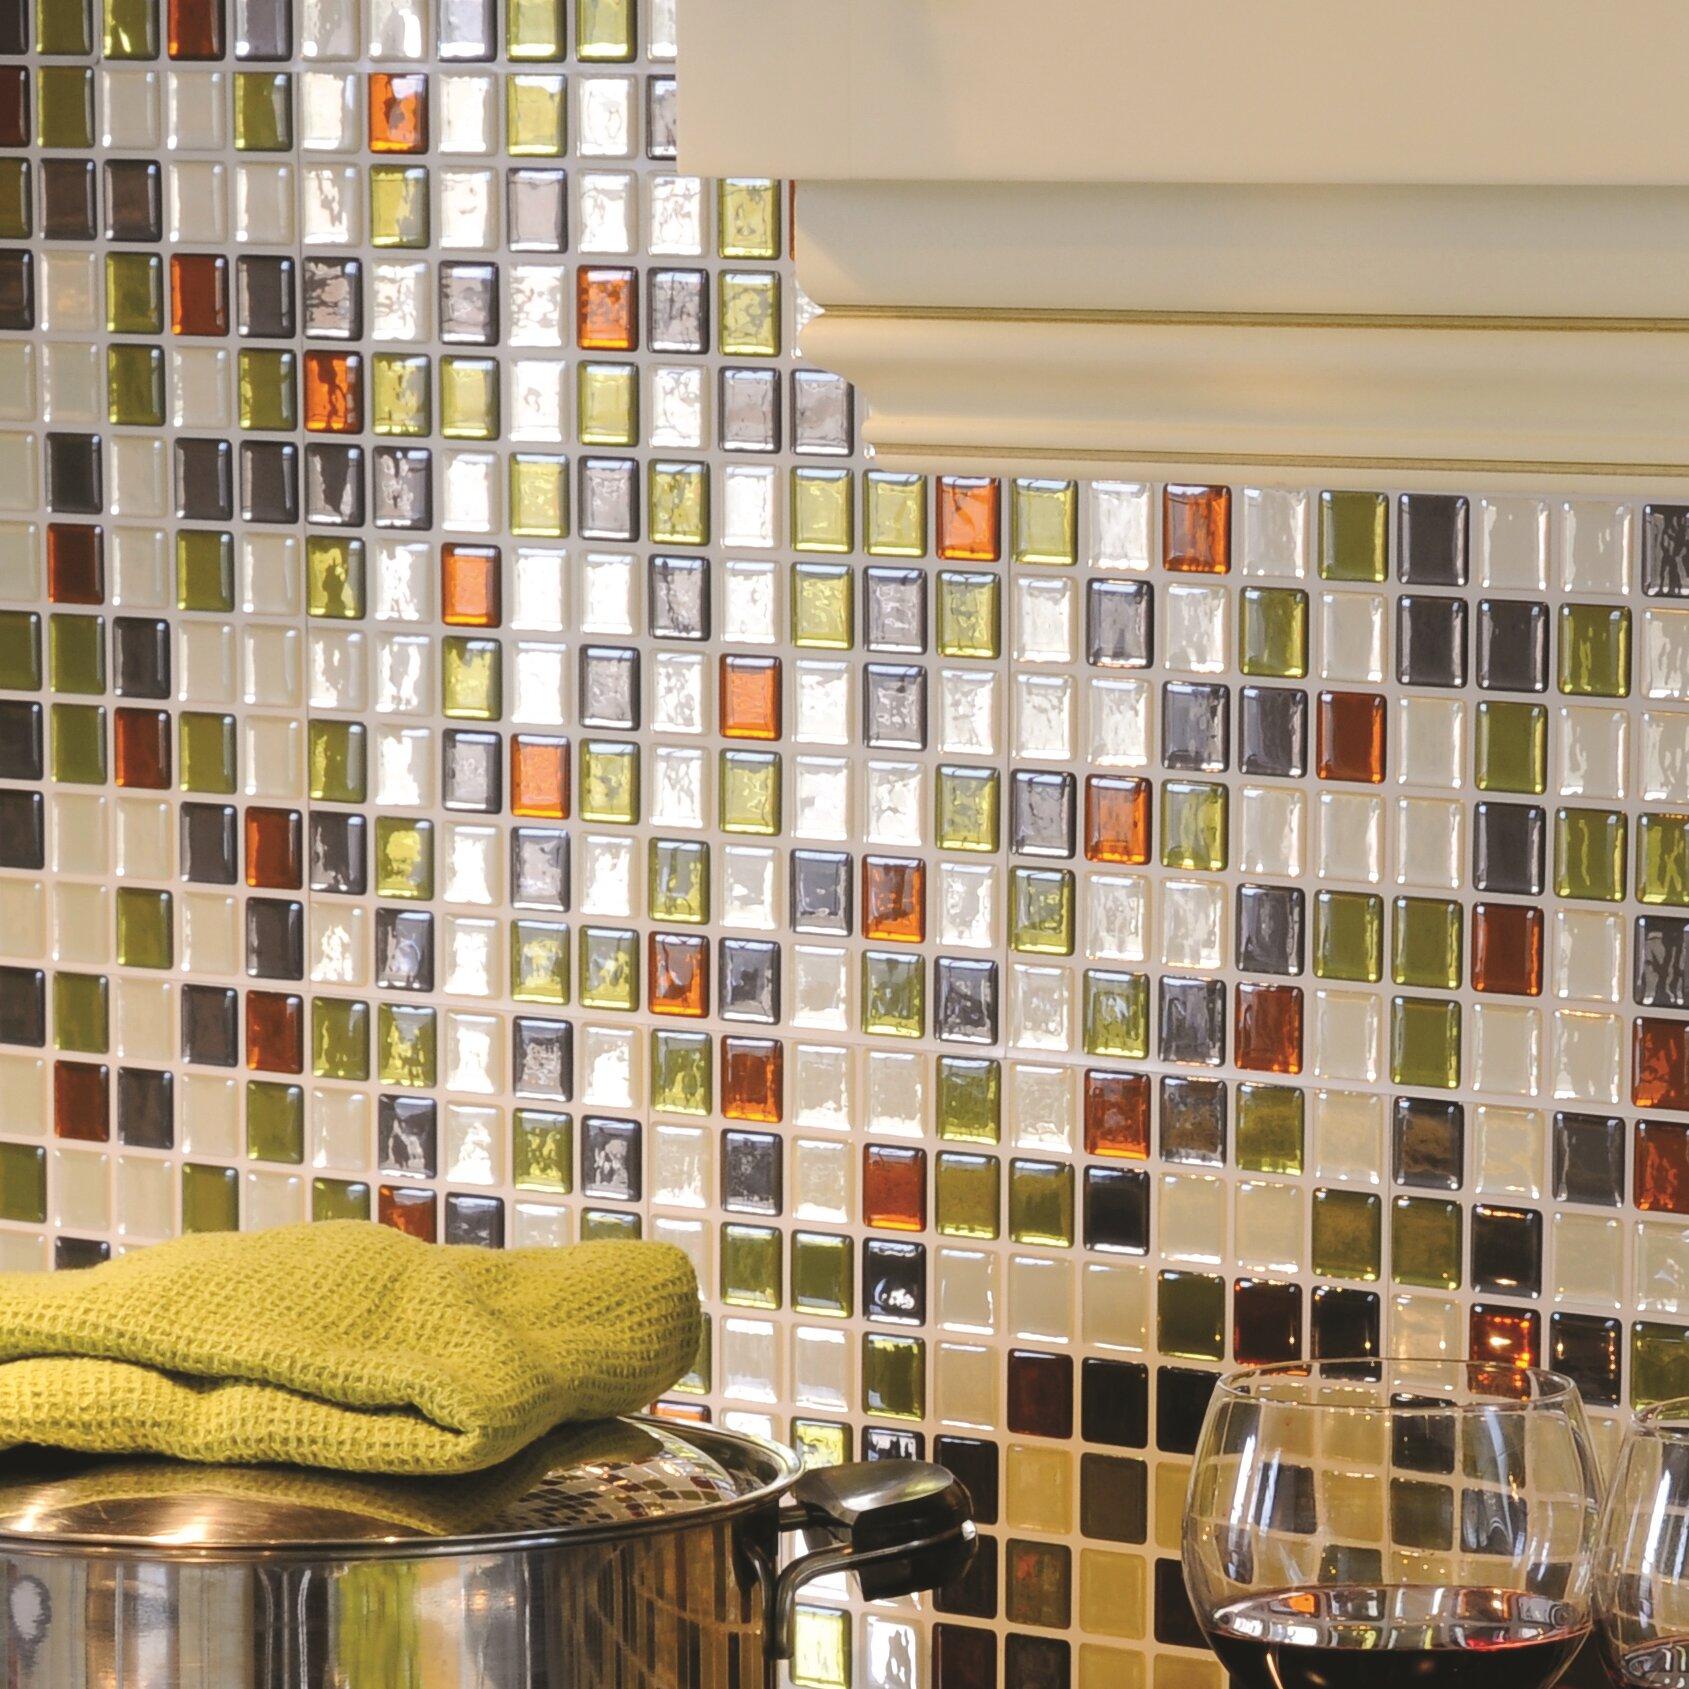 smart tiles mosaik idaho x peel stick wall tile in beige green rust reviews. Black Bedroom Furniture Sets. Home Design Ideas